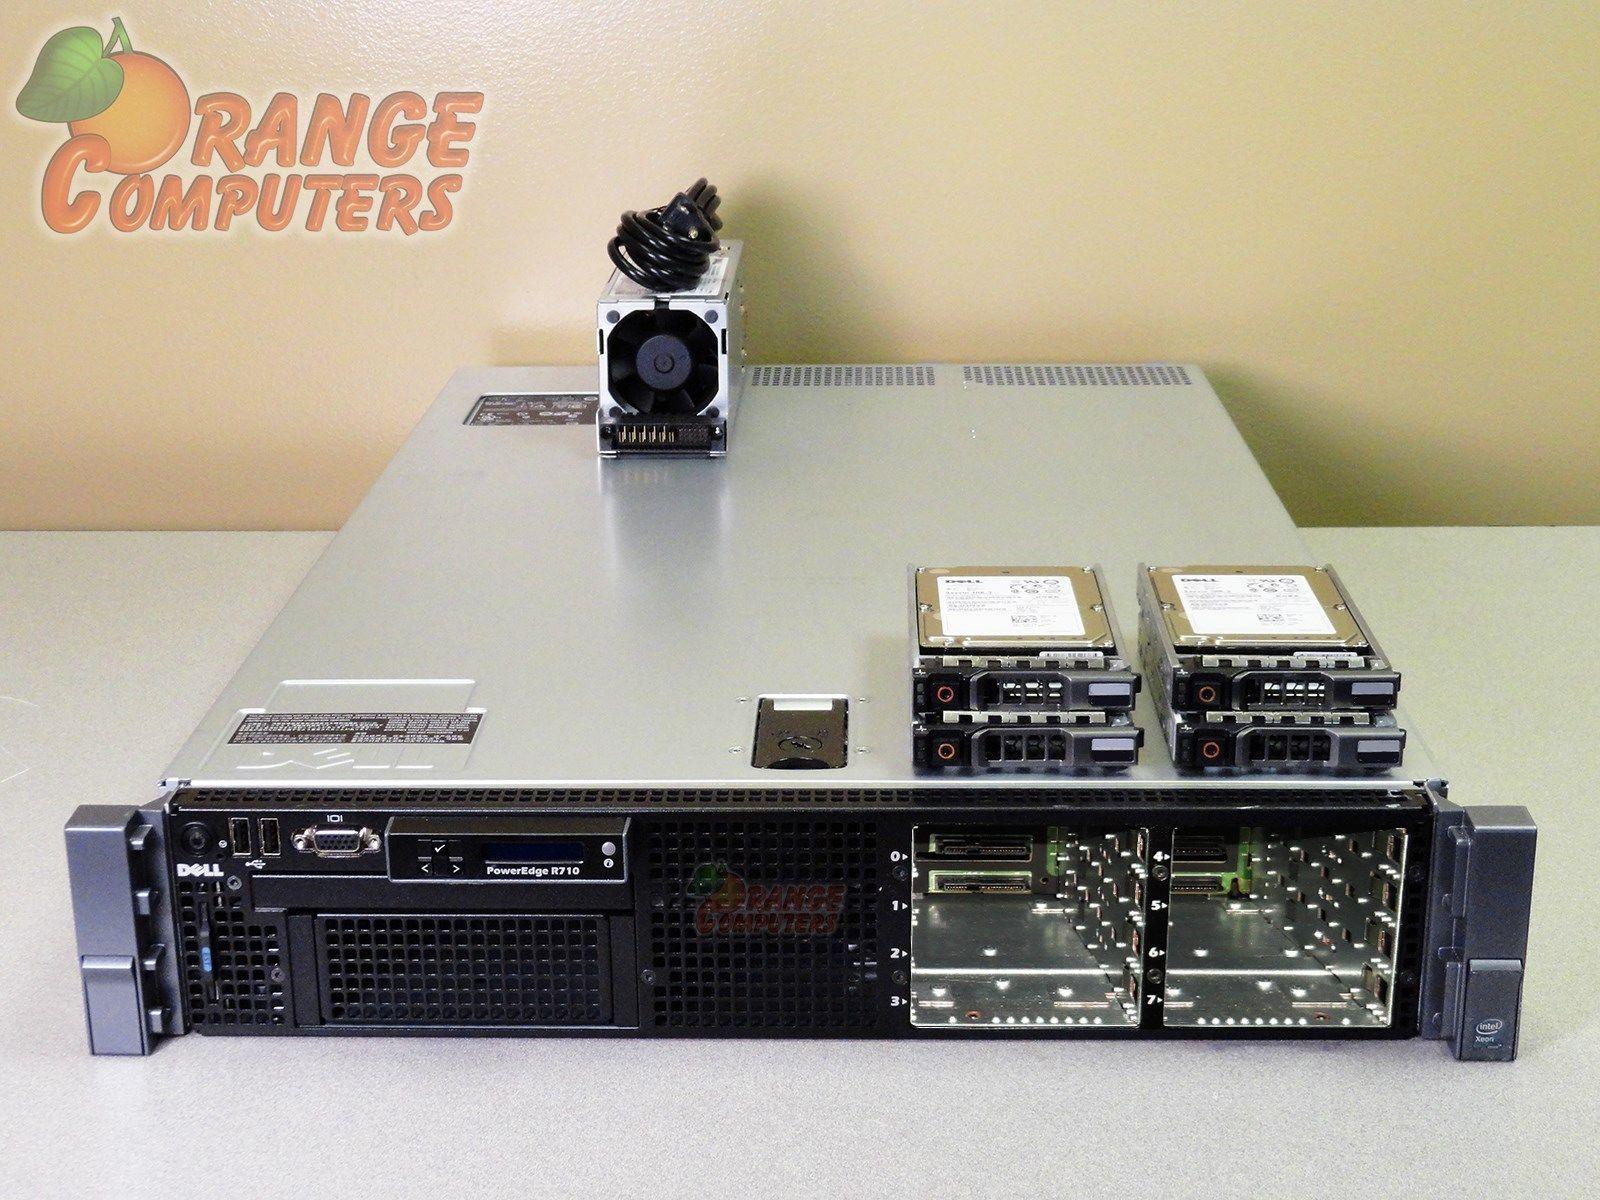 Dell PowerEdge R610 Server 2x 2.4 GHz Quad Core RPS 6x 146GB 15k PERC6 32GB